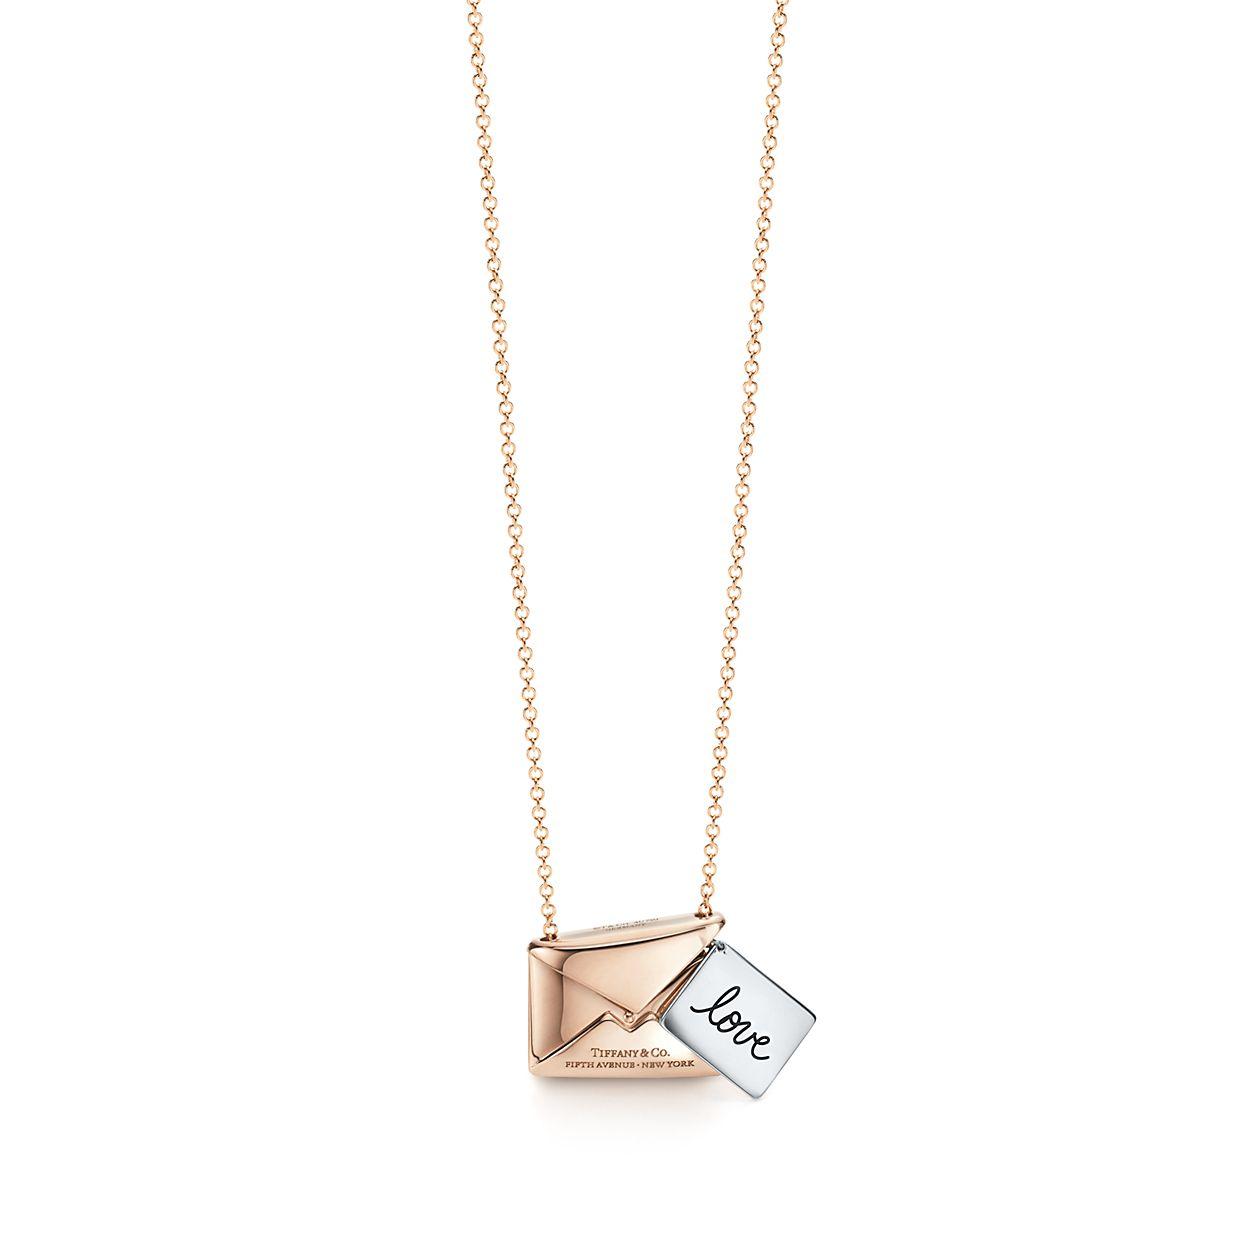 18k rose gold love letter pendant necklace tiffany co tiffany tiffany charmssweet nothingsbrlove letter pendant aloadofball Choice Image